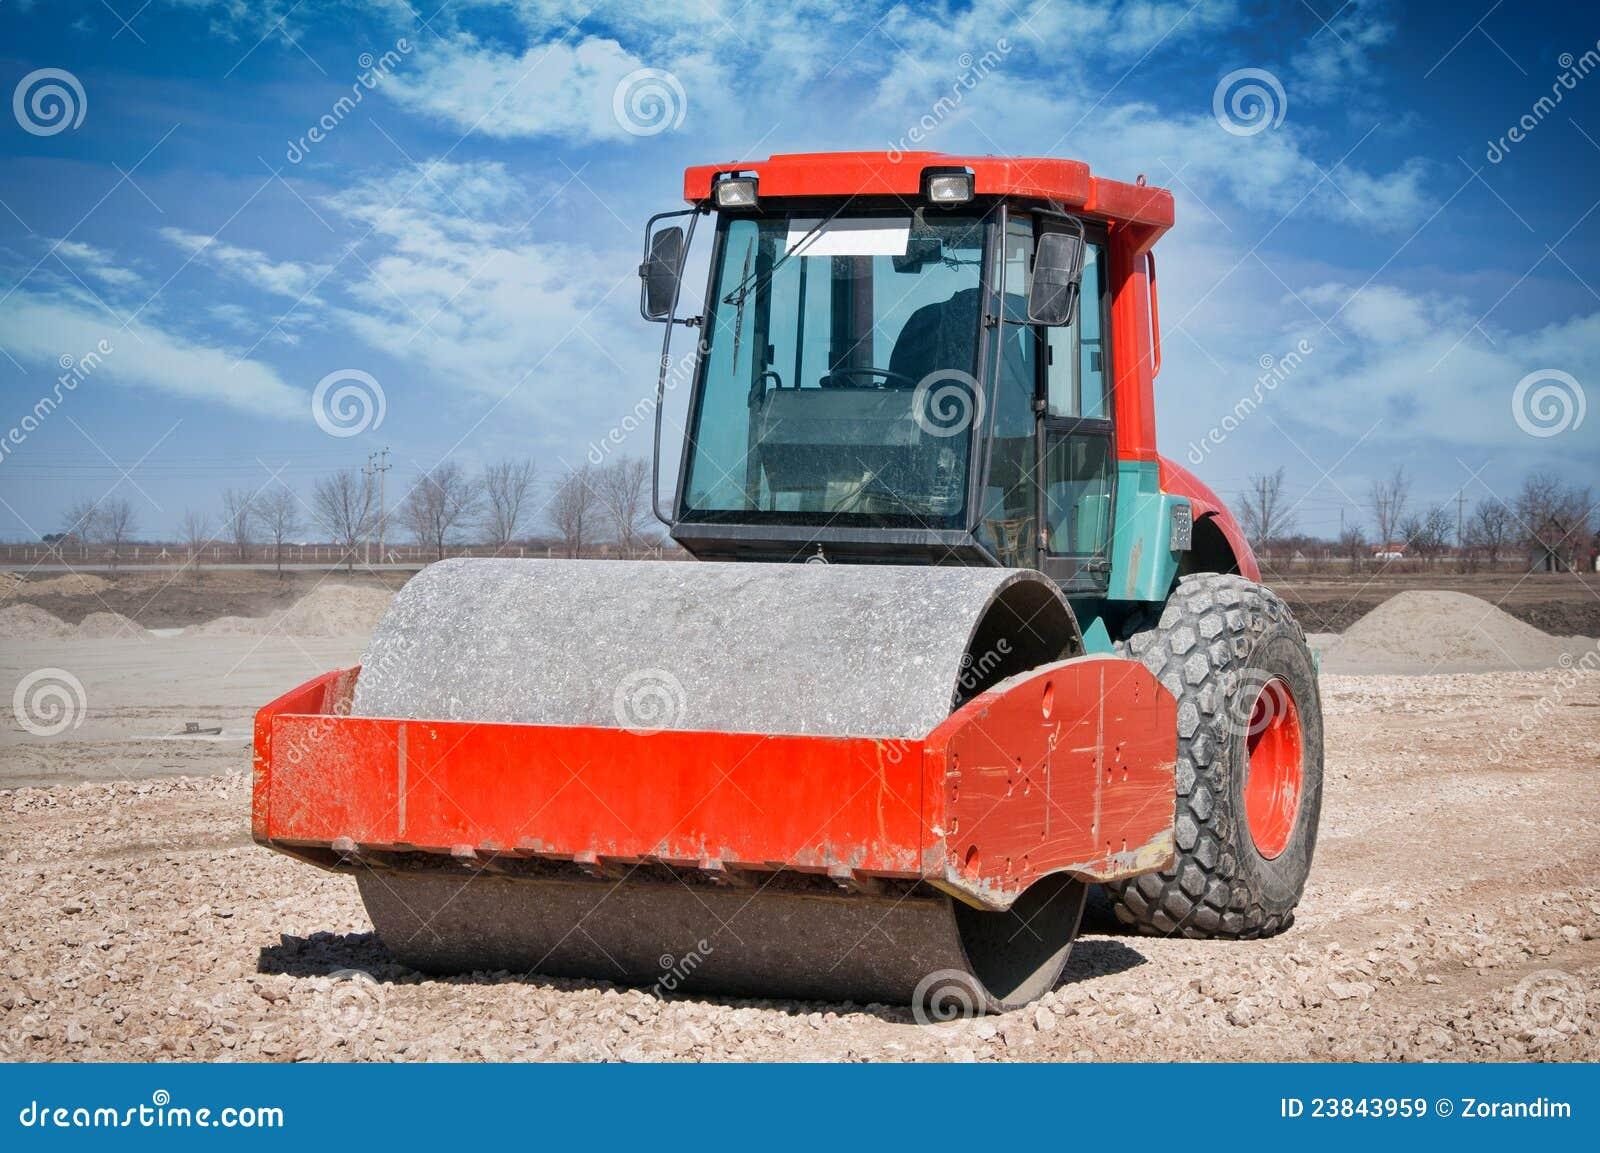 Heavy Duty Construction : Heavy duty construction equipment stock image of